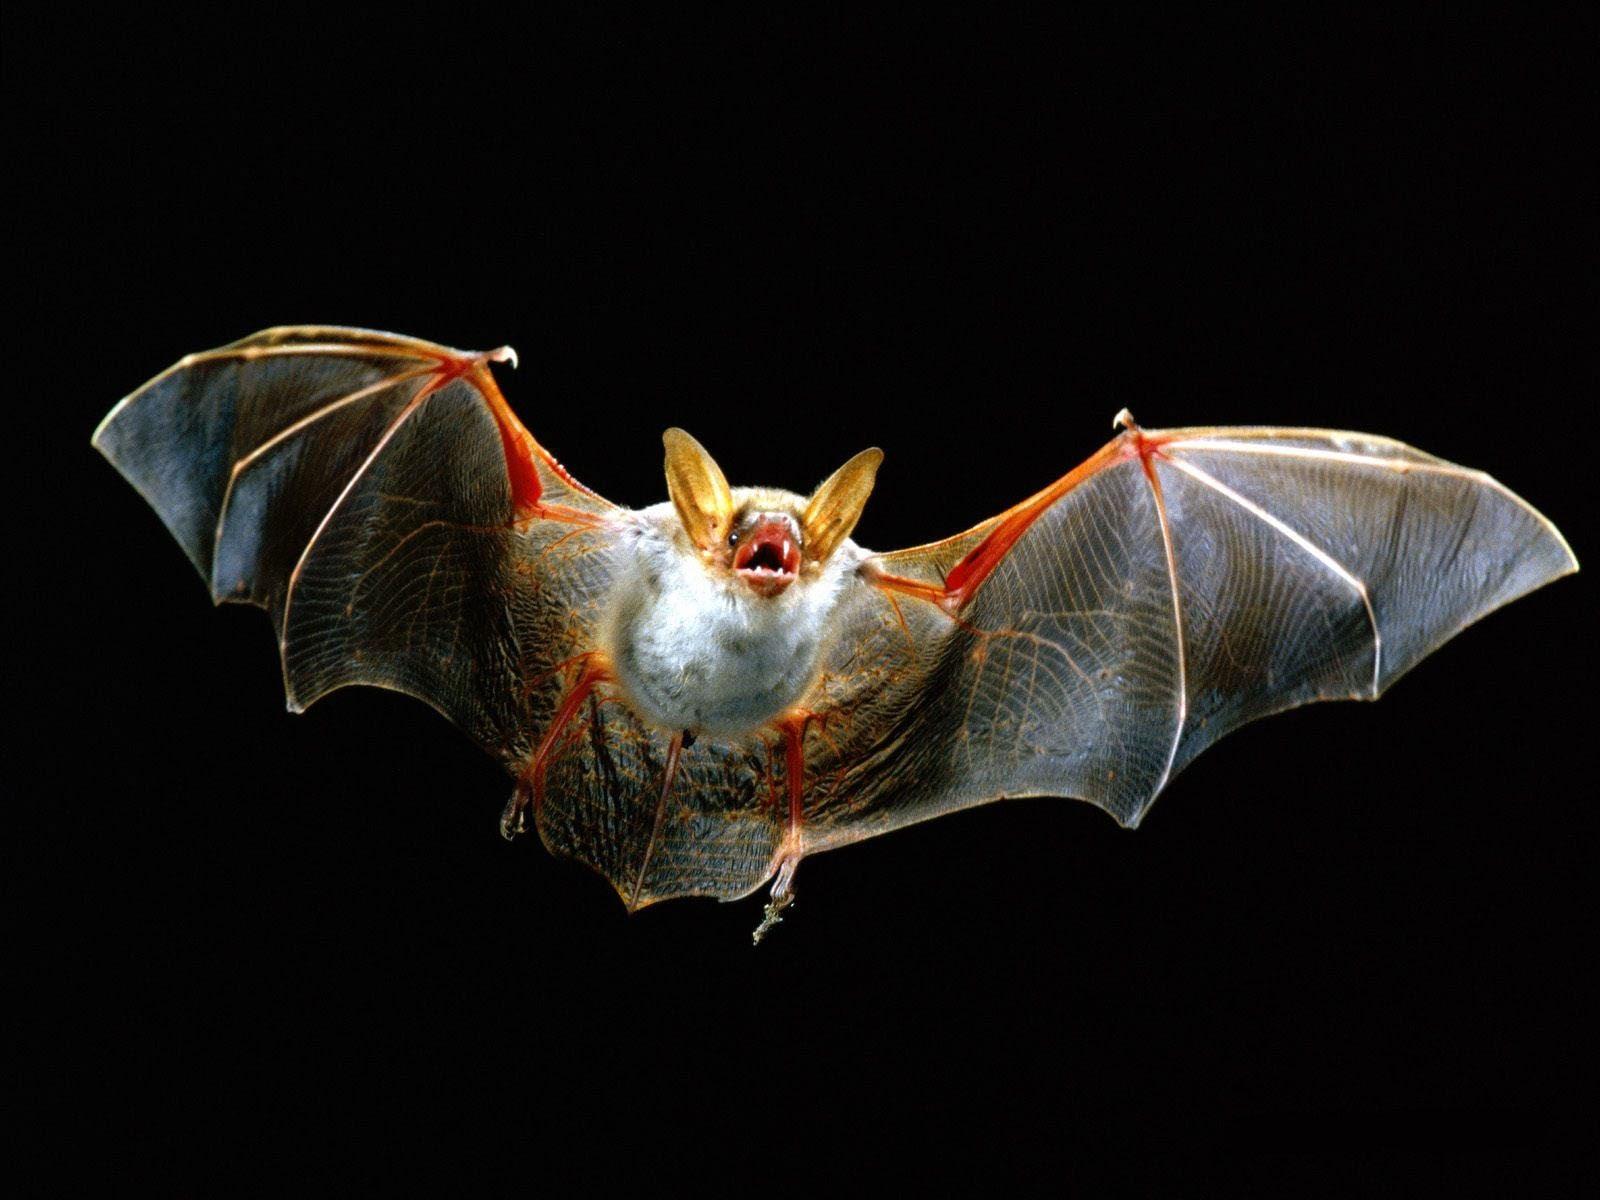 Bat for mobile